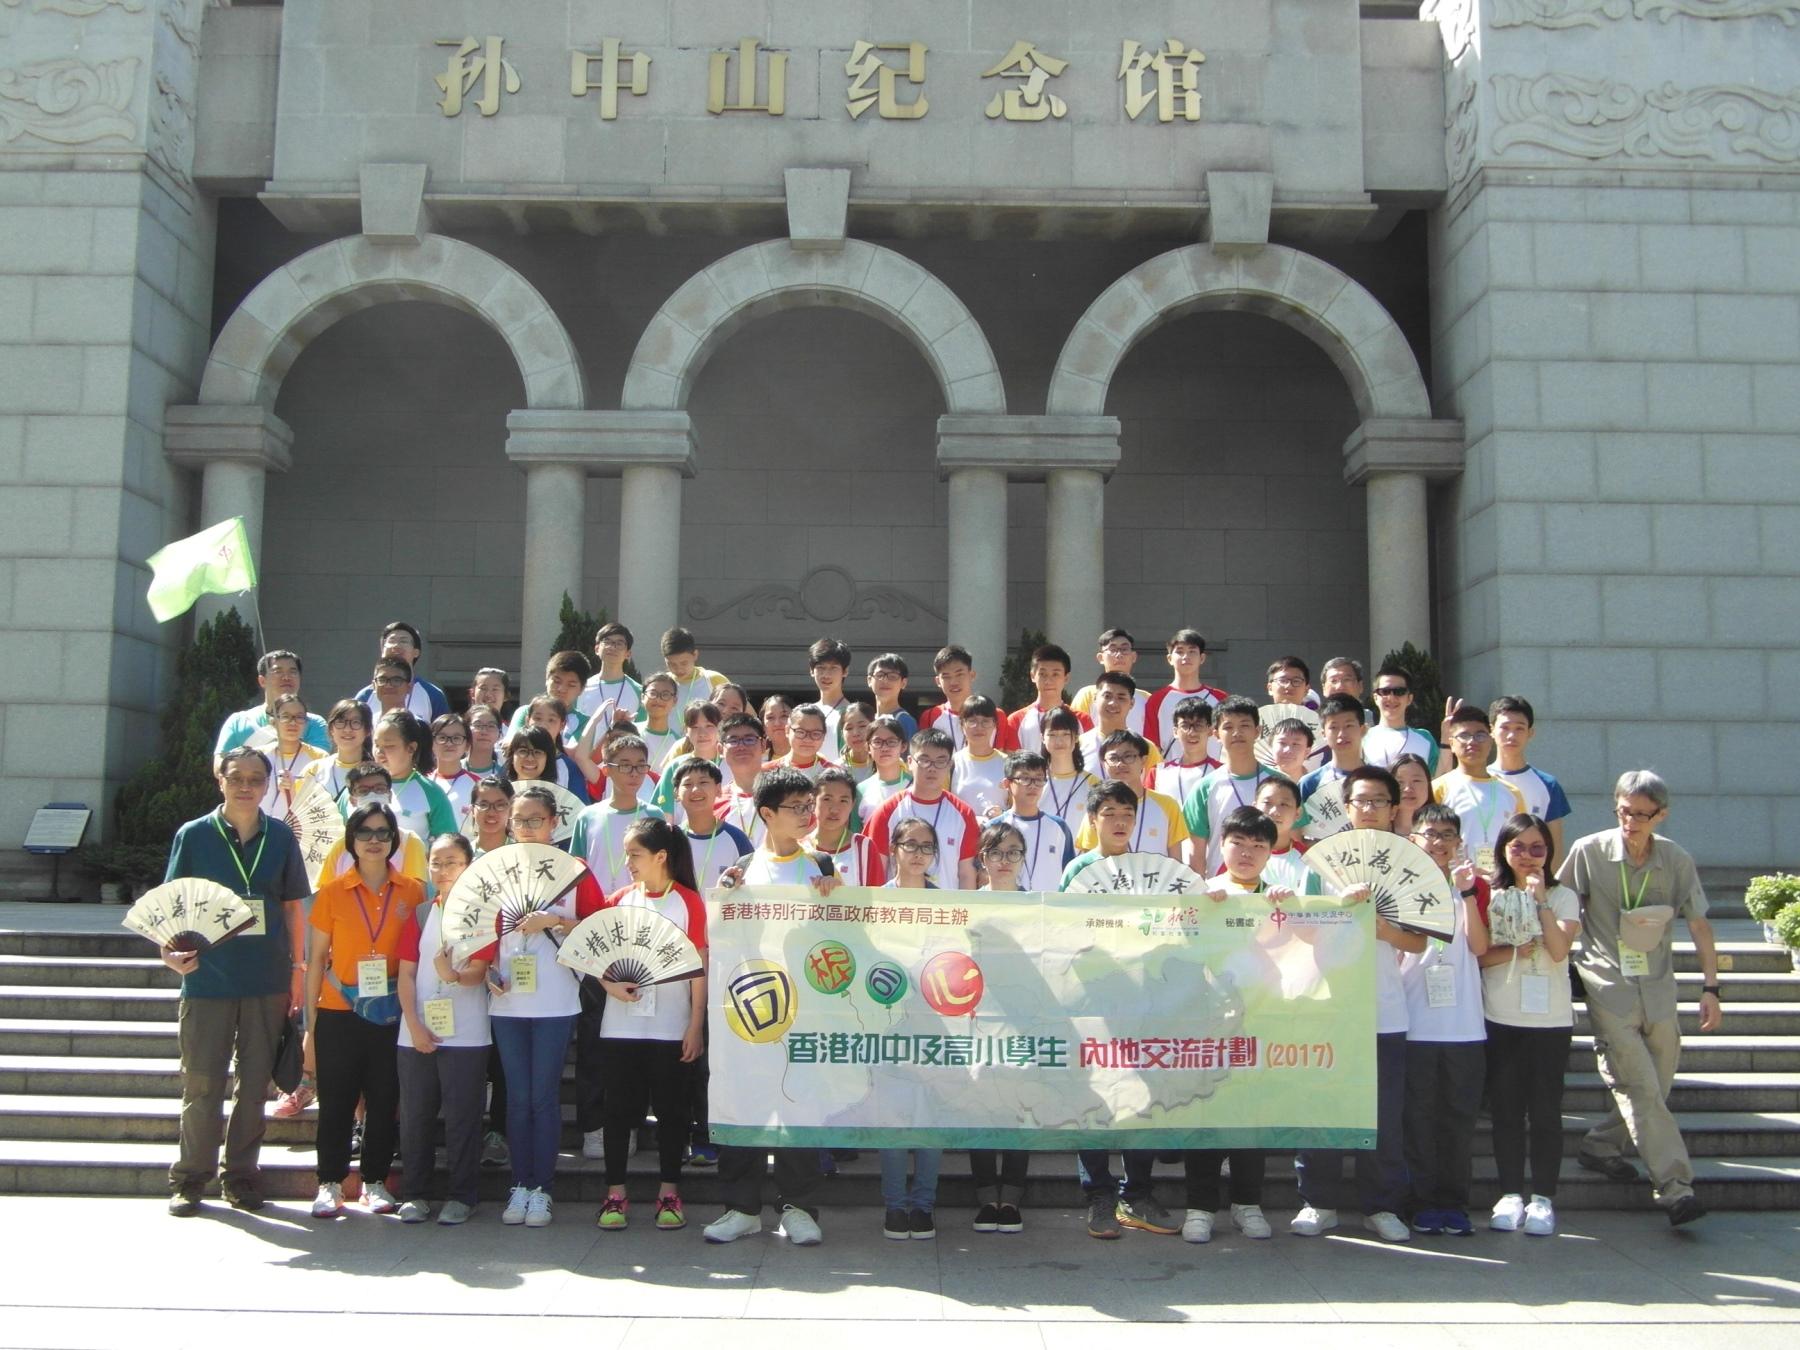 http://www.npc.edu.hk/sites/default/files/sam_4182.jpg